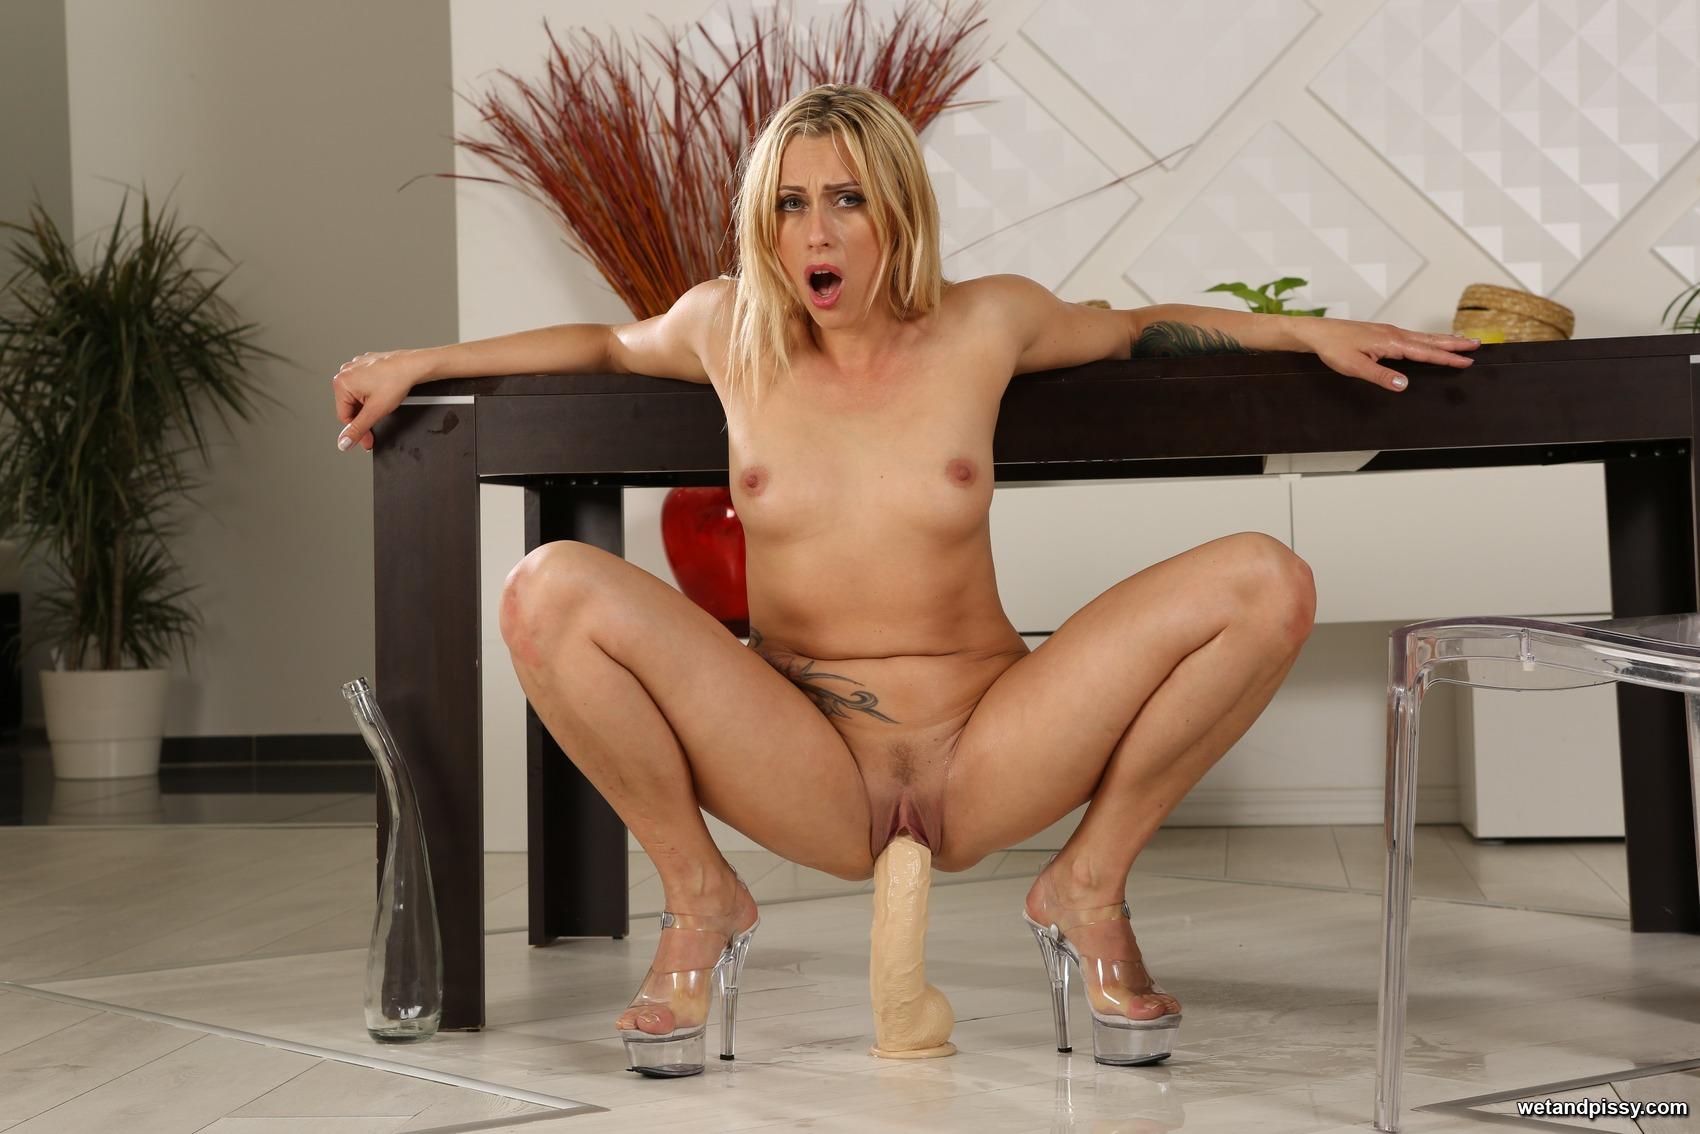 Blonde german pornstar fingers her wet pussy private